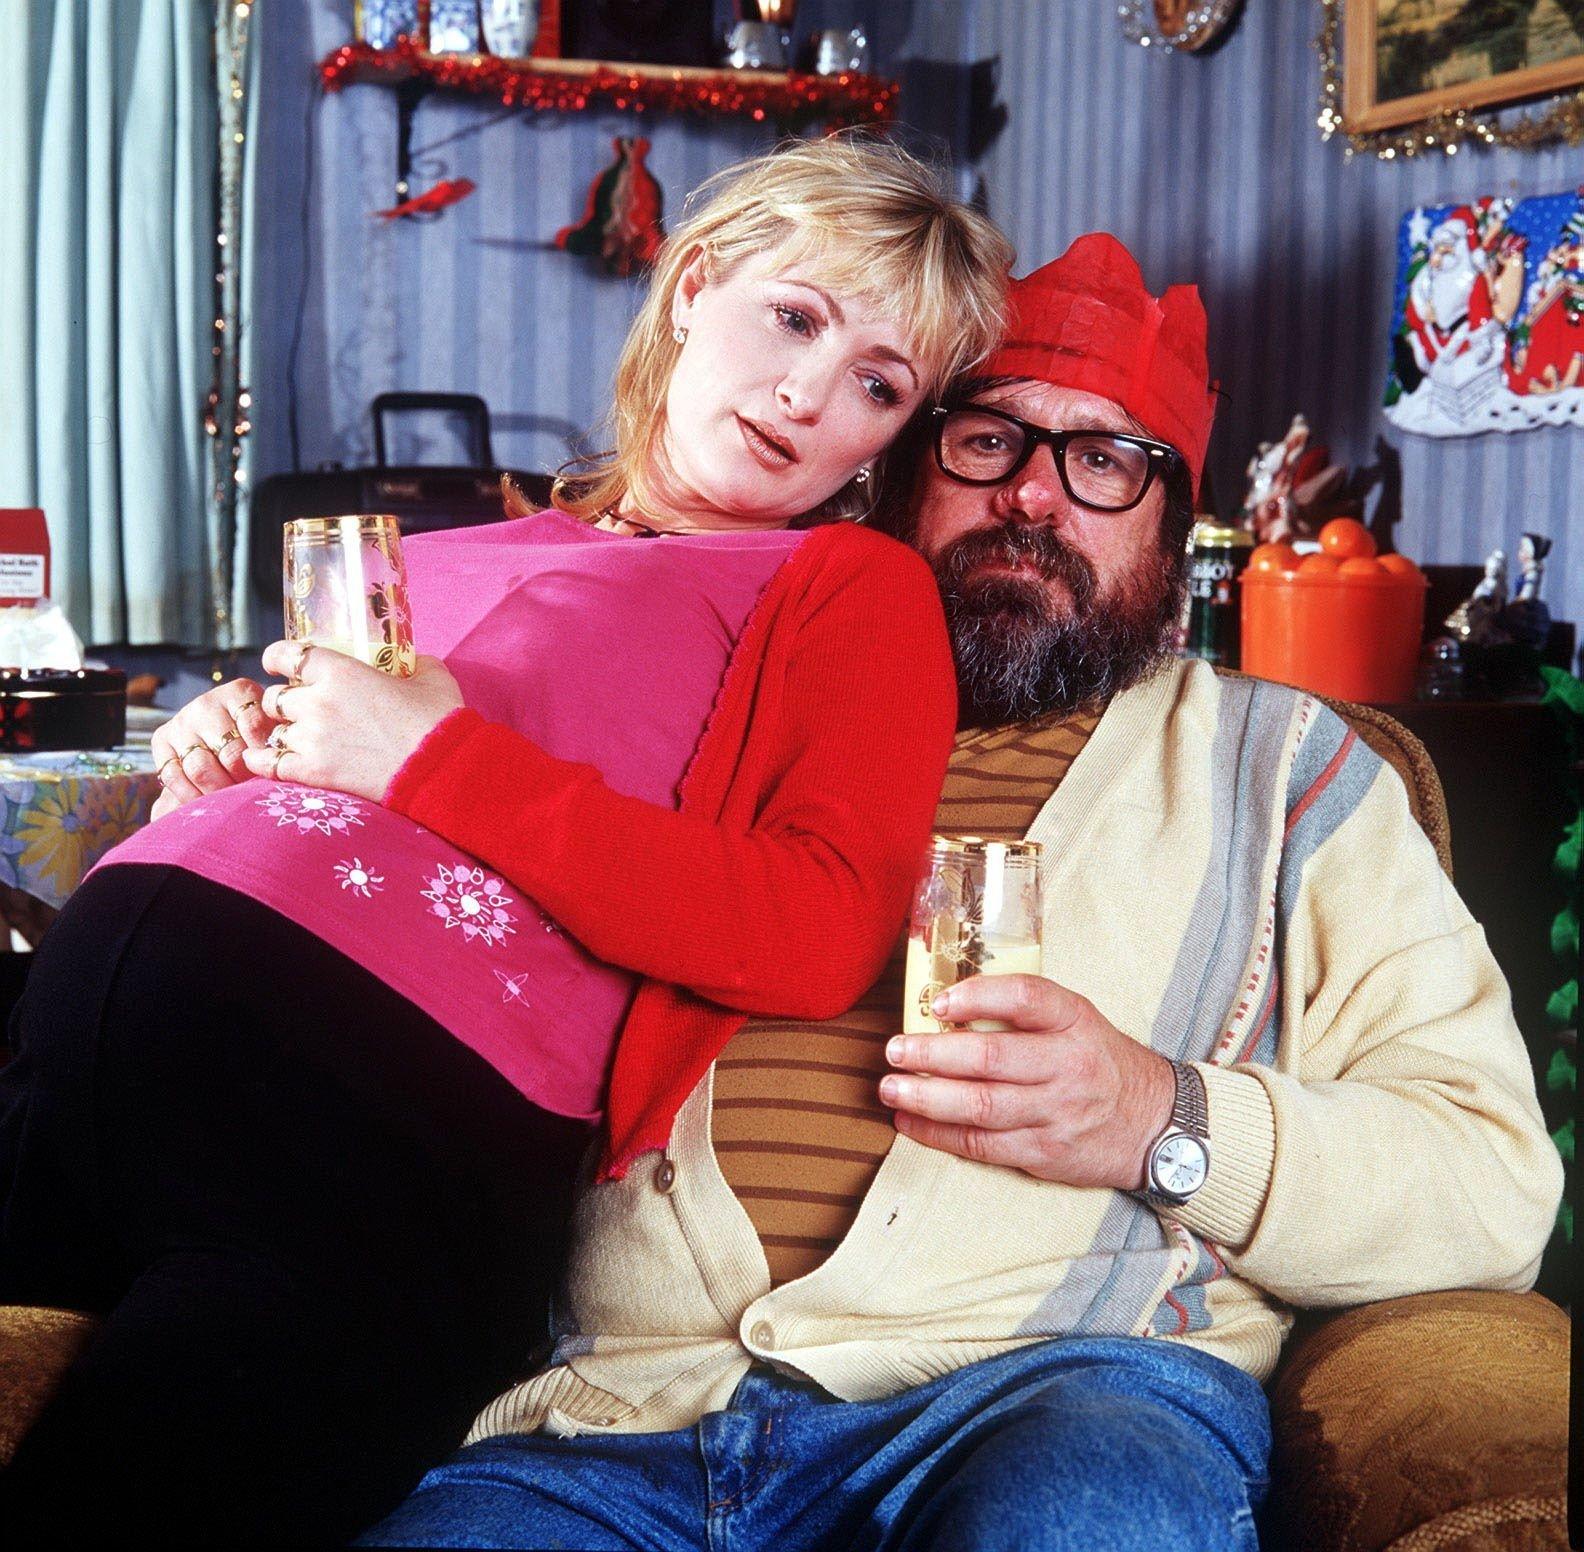 Ricky Tomlinson and Caroline Aherne starred together on 'The Royle